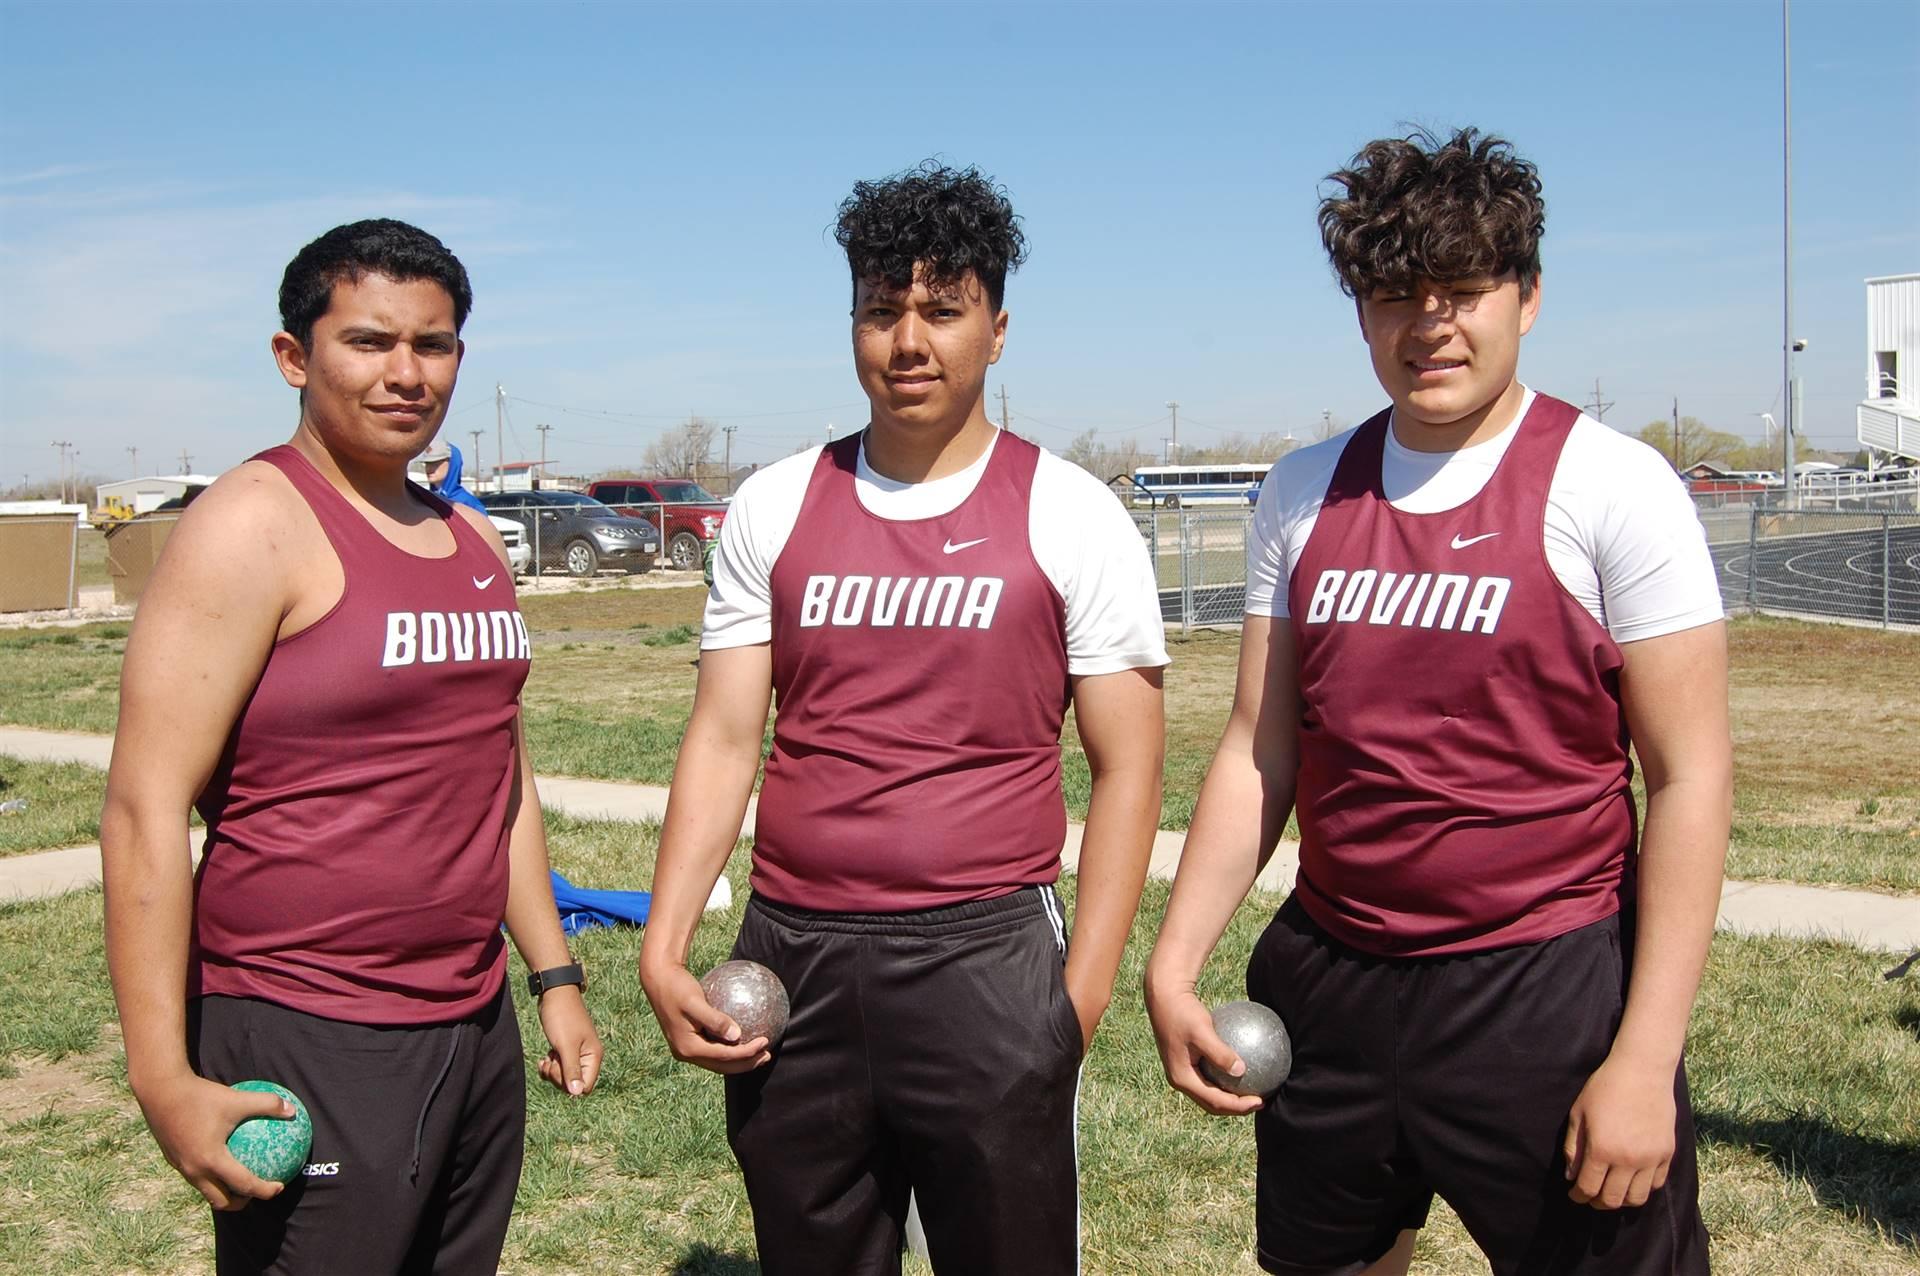 Bovina Track and Field Team